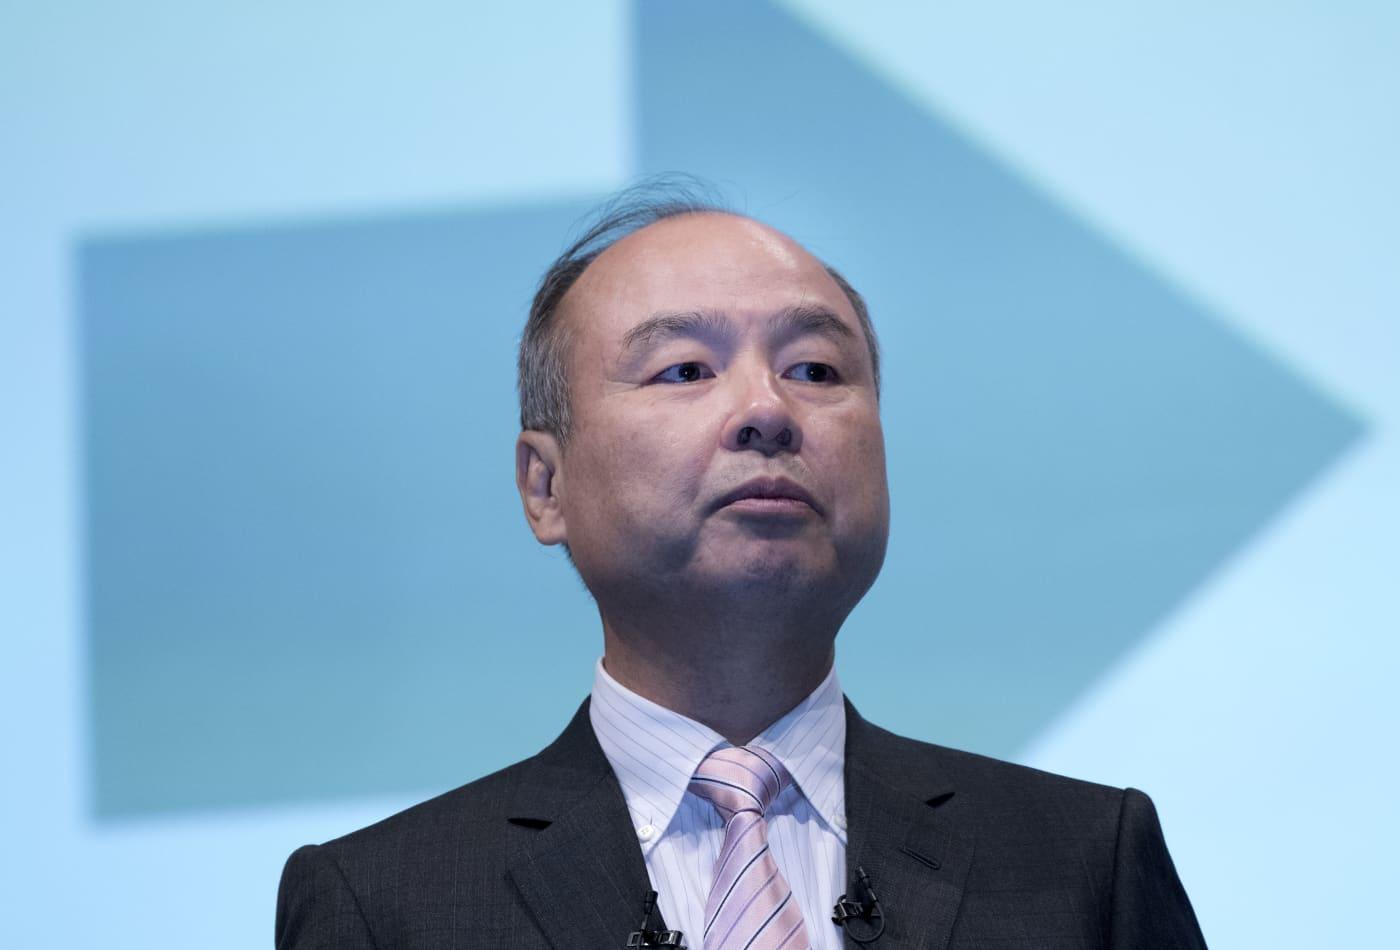 SoftBank values WeWork at $2.9 billion, down from $47 billion a year ago